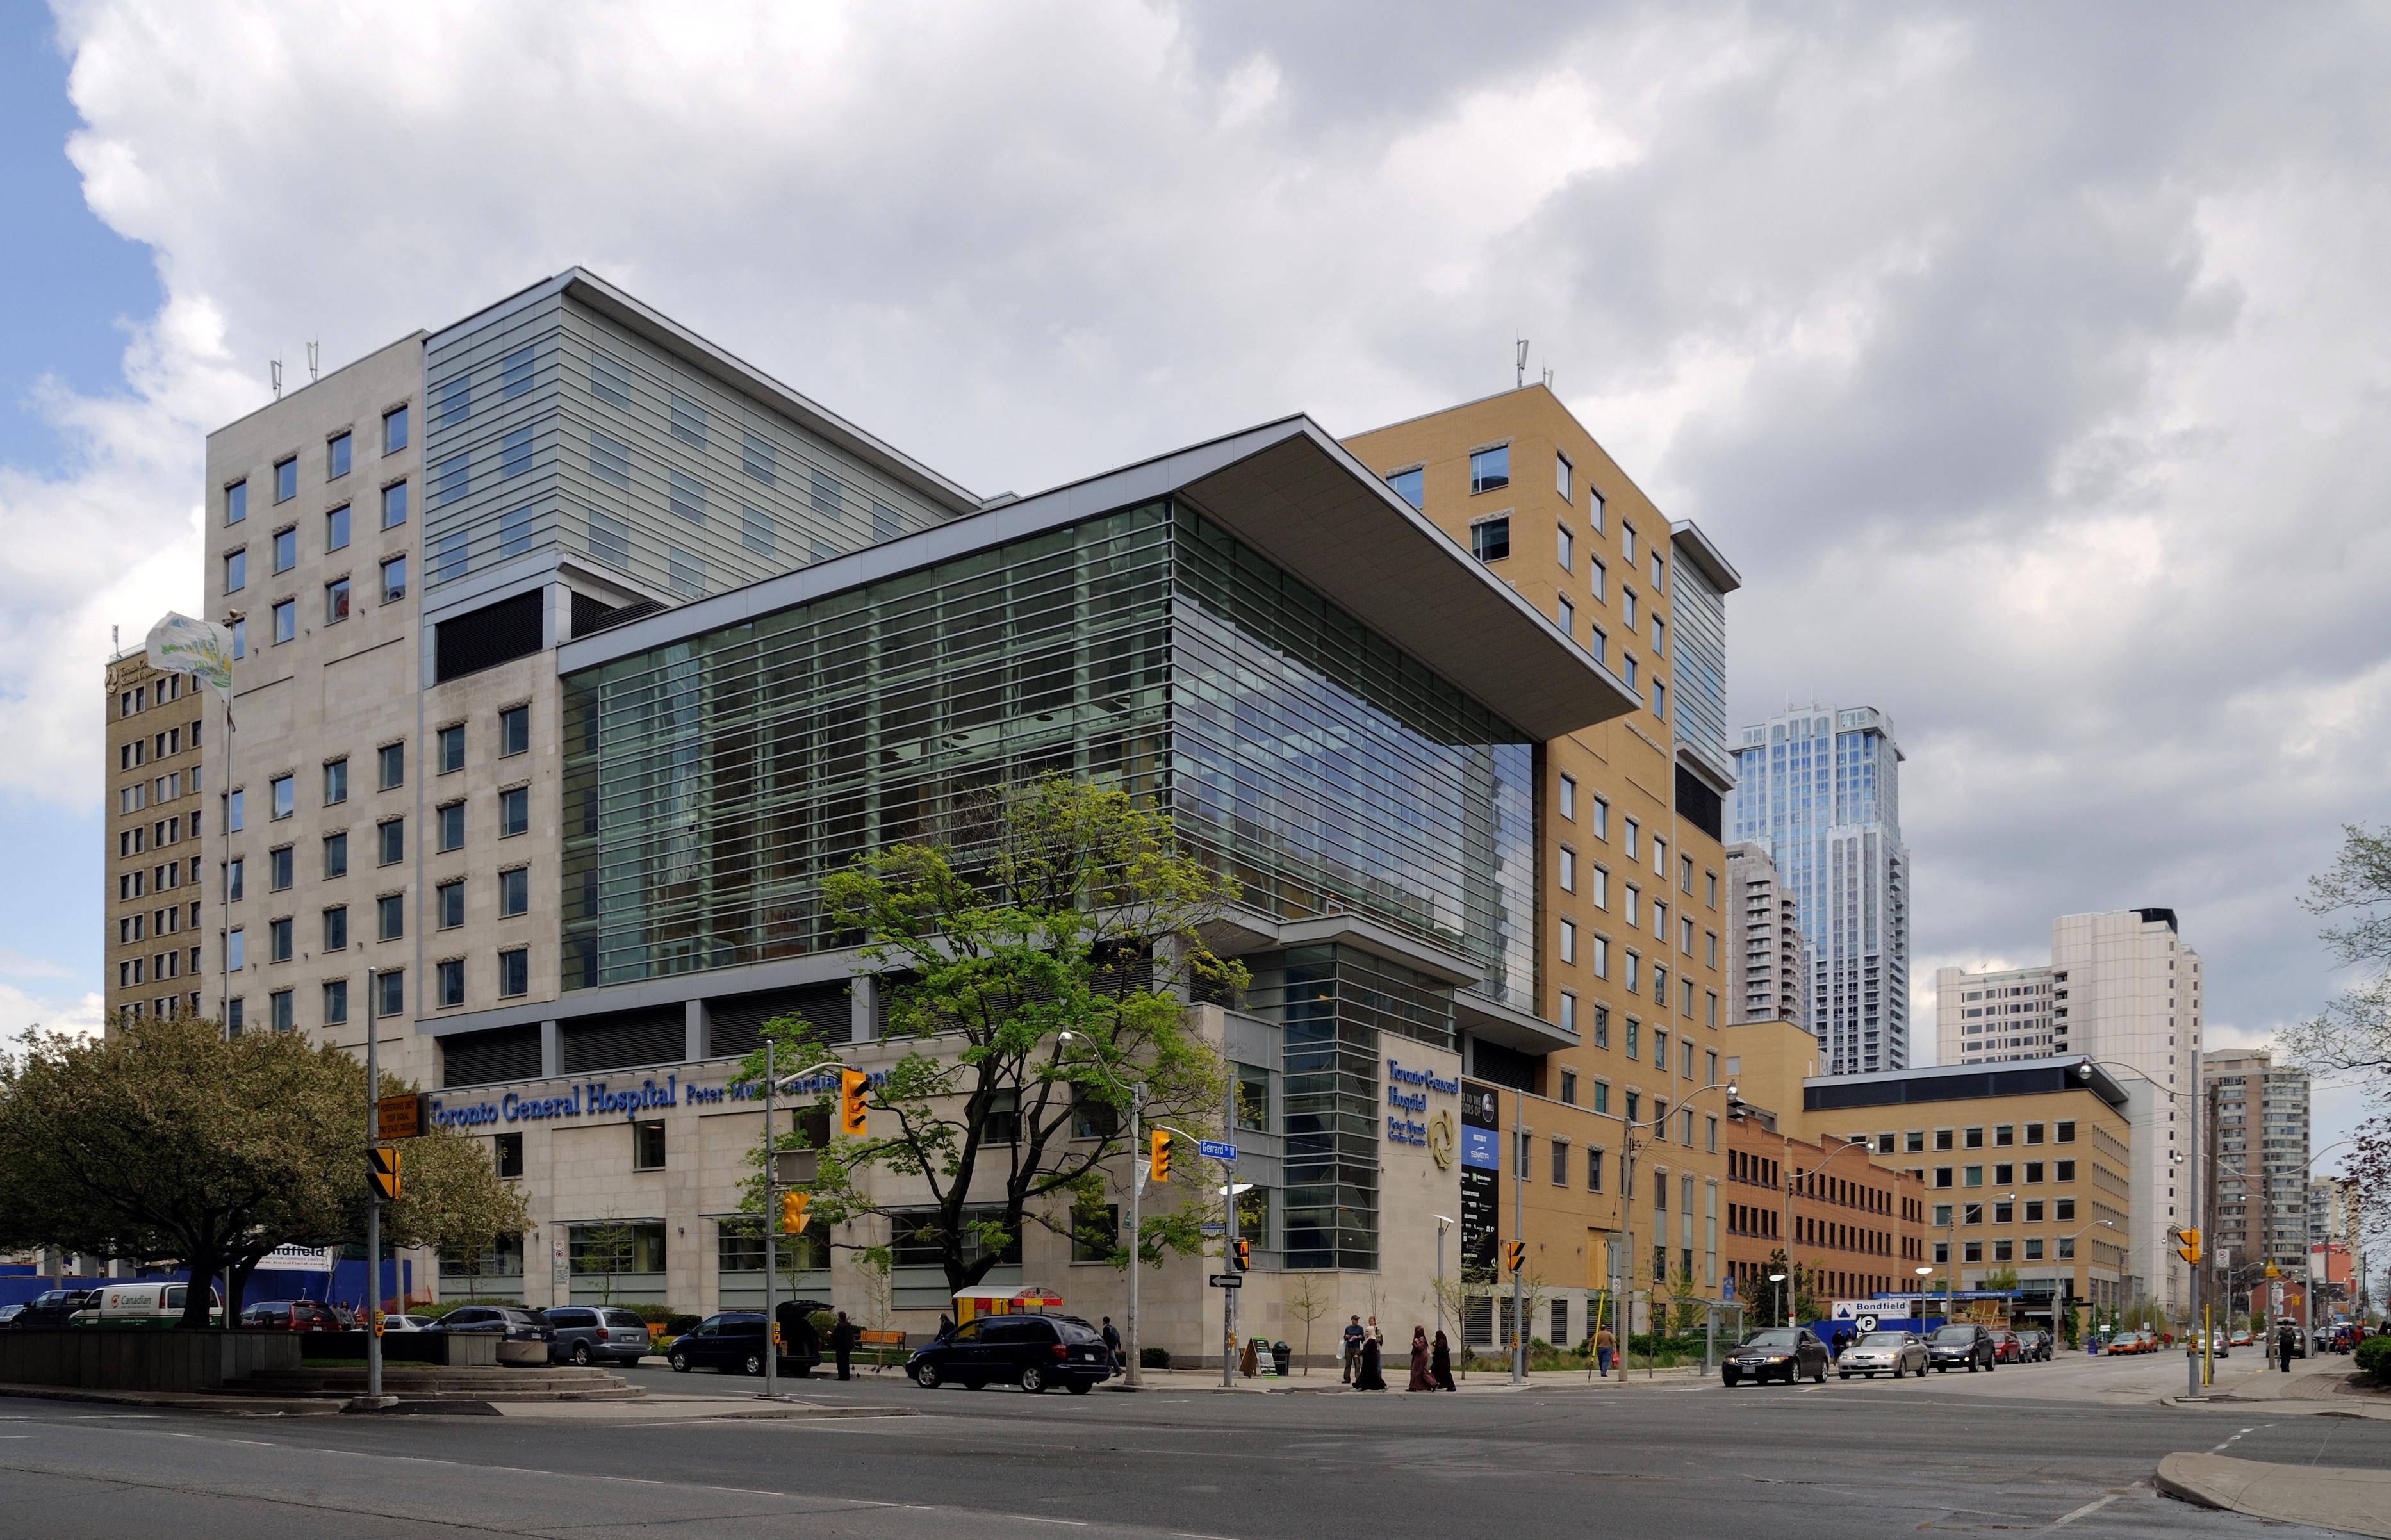 Toronto General (University Health Network)